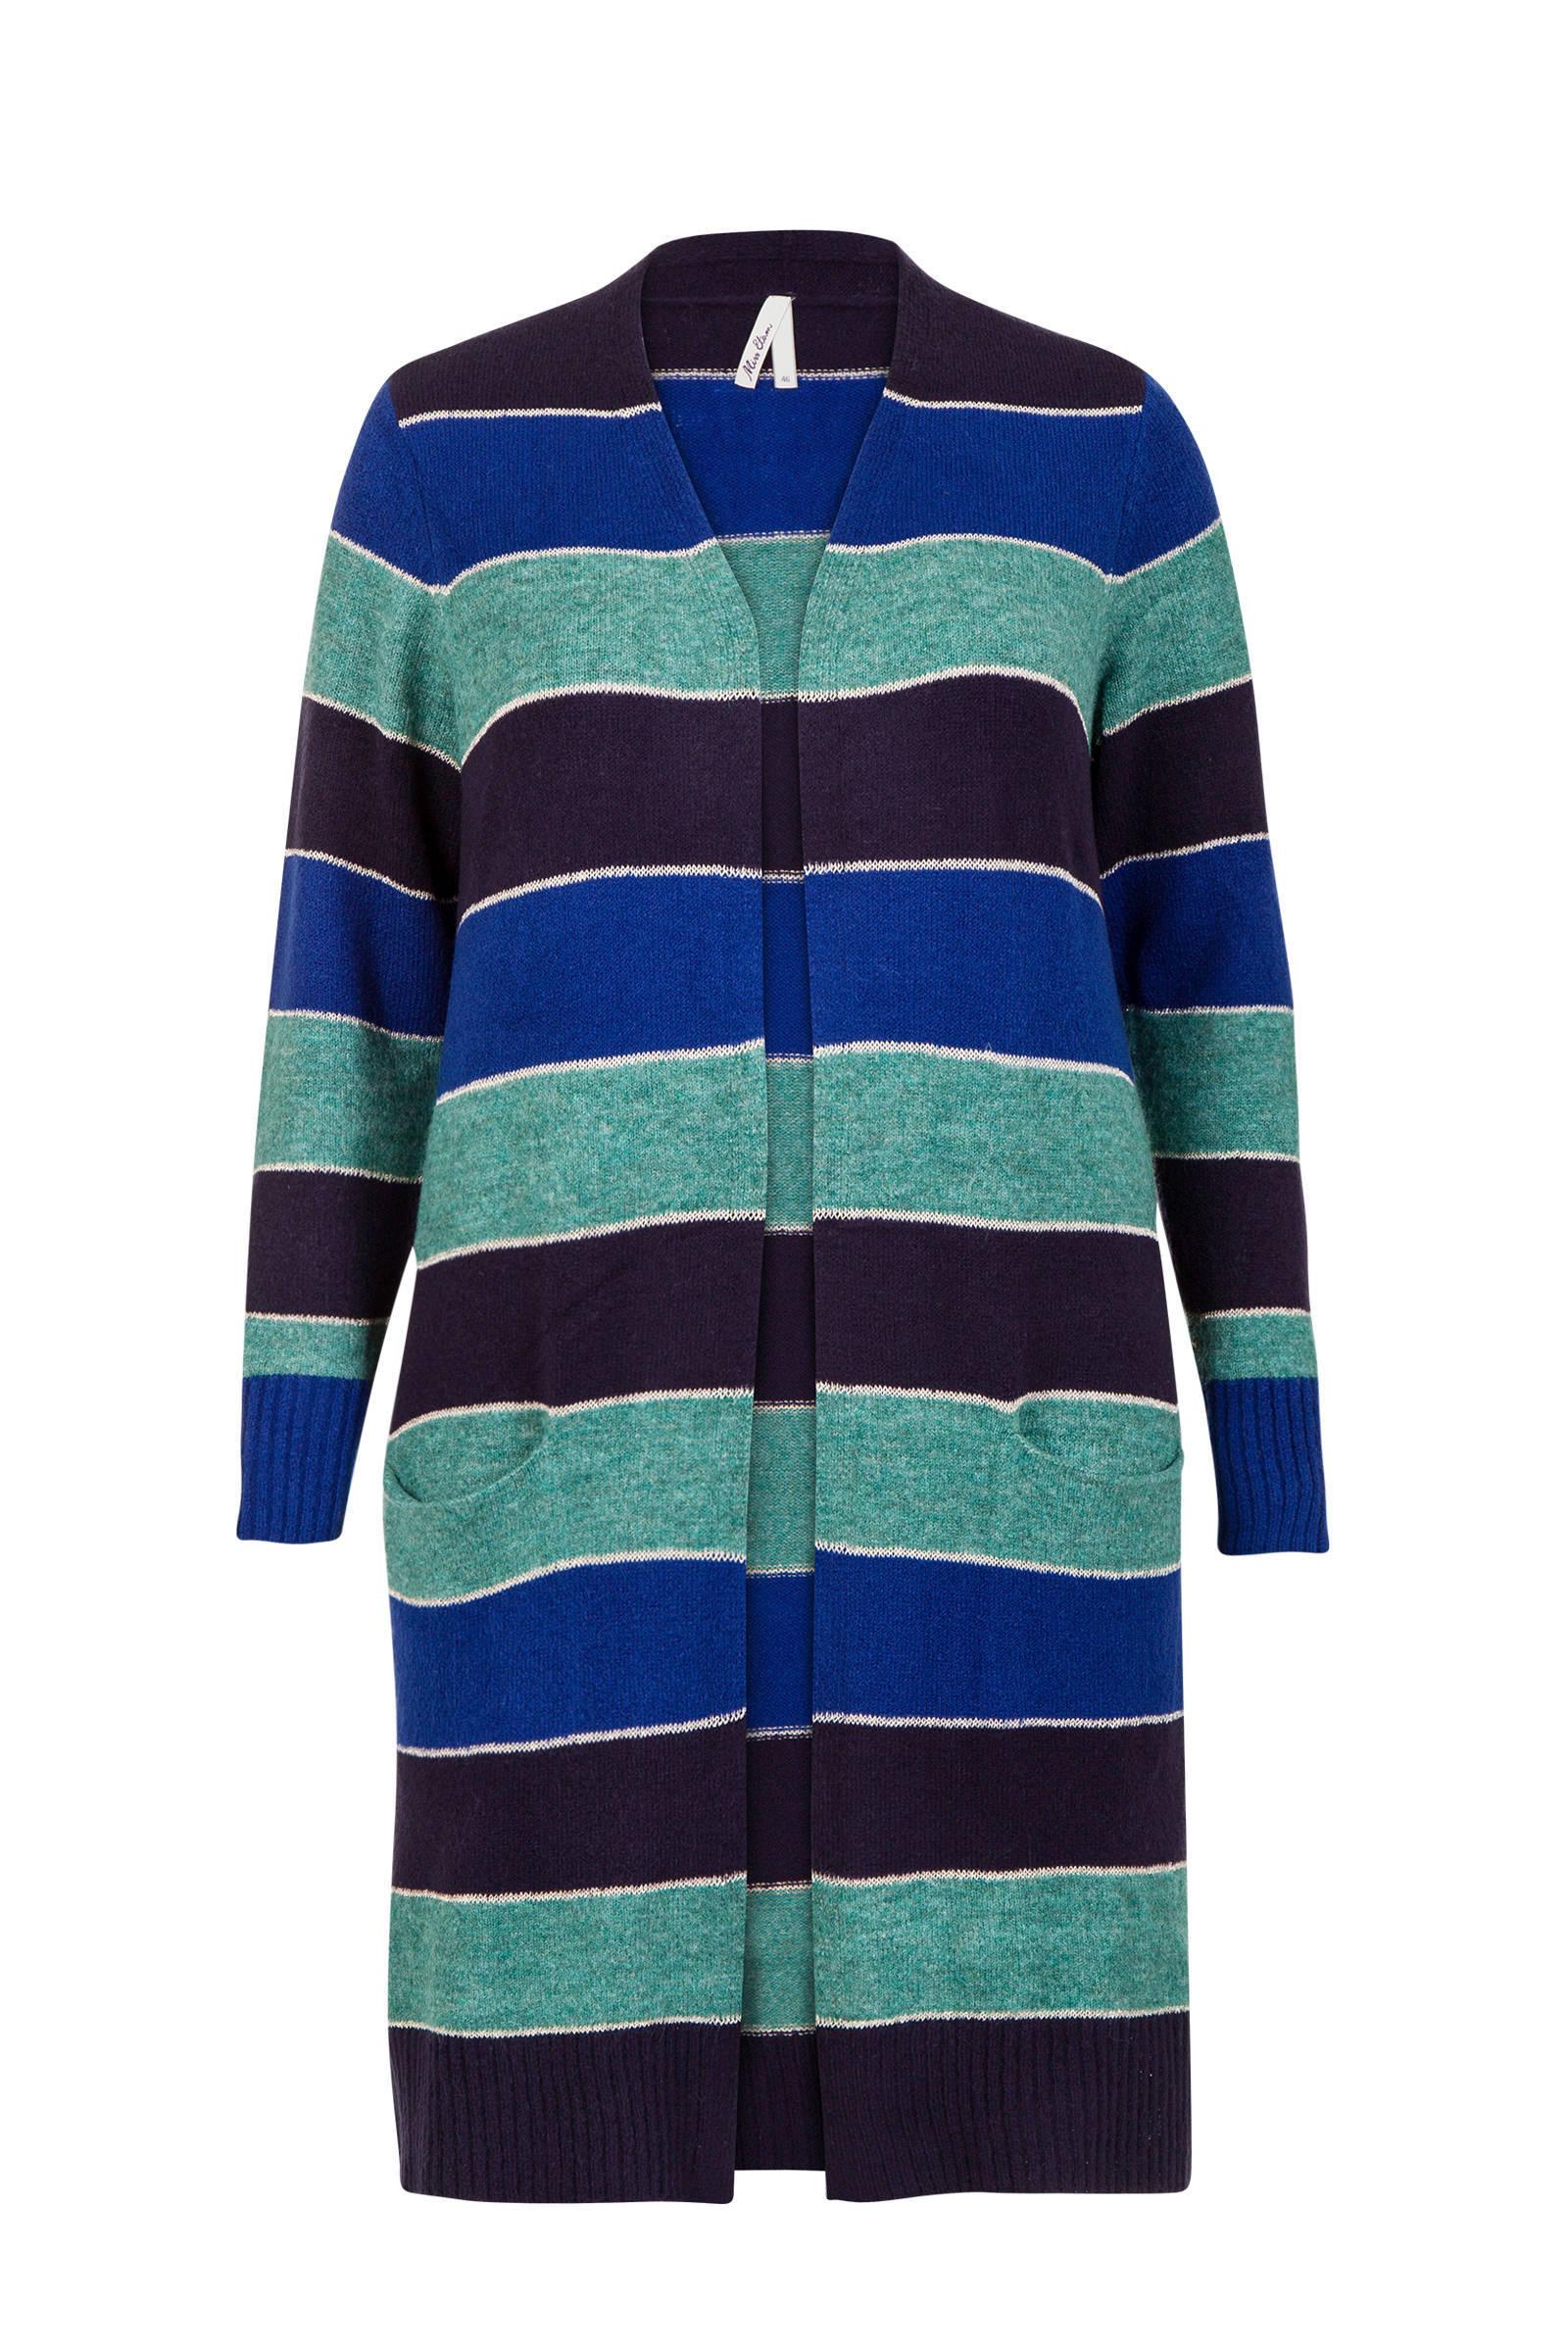 cheap for discount e8e22 e44d4 miss-etam-plus-gestreept-vest-turquoise-blauw-turquoise-8719832137229.jpg